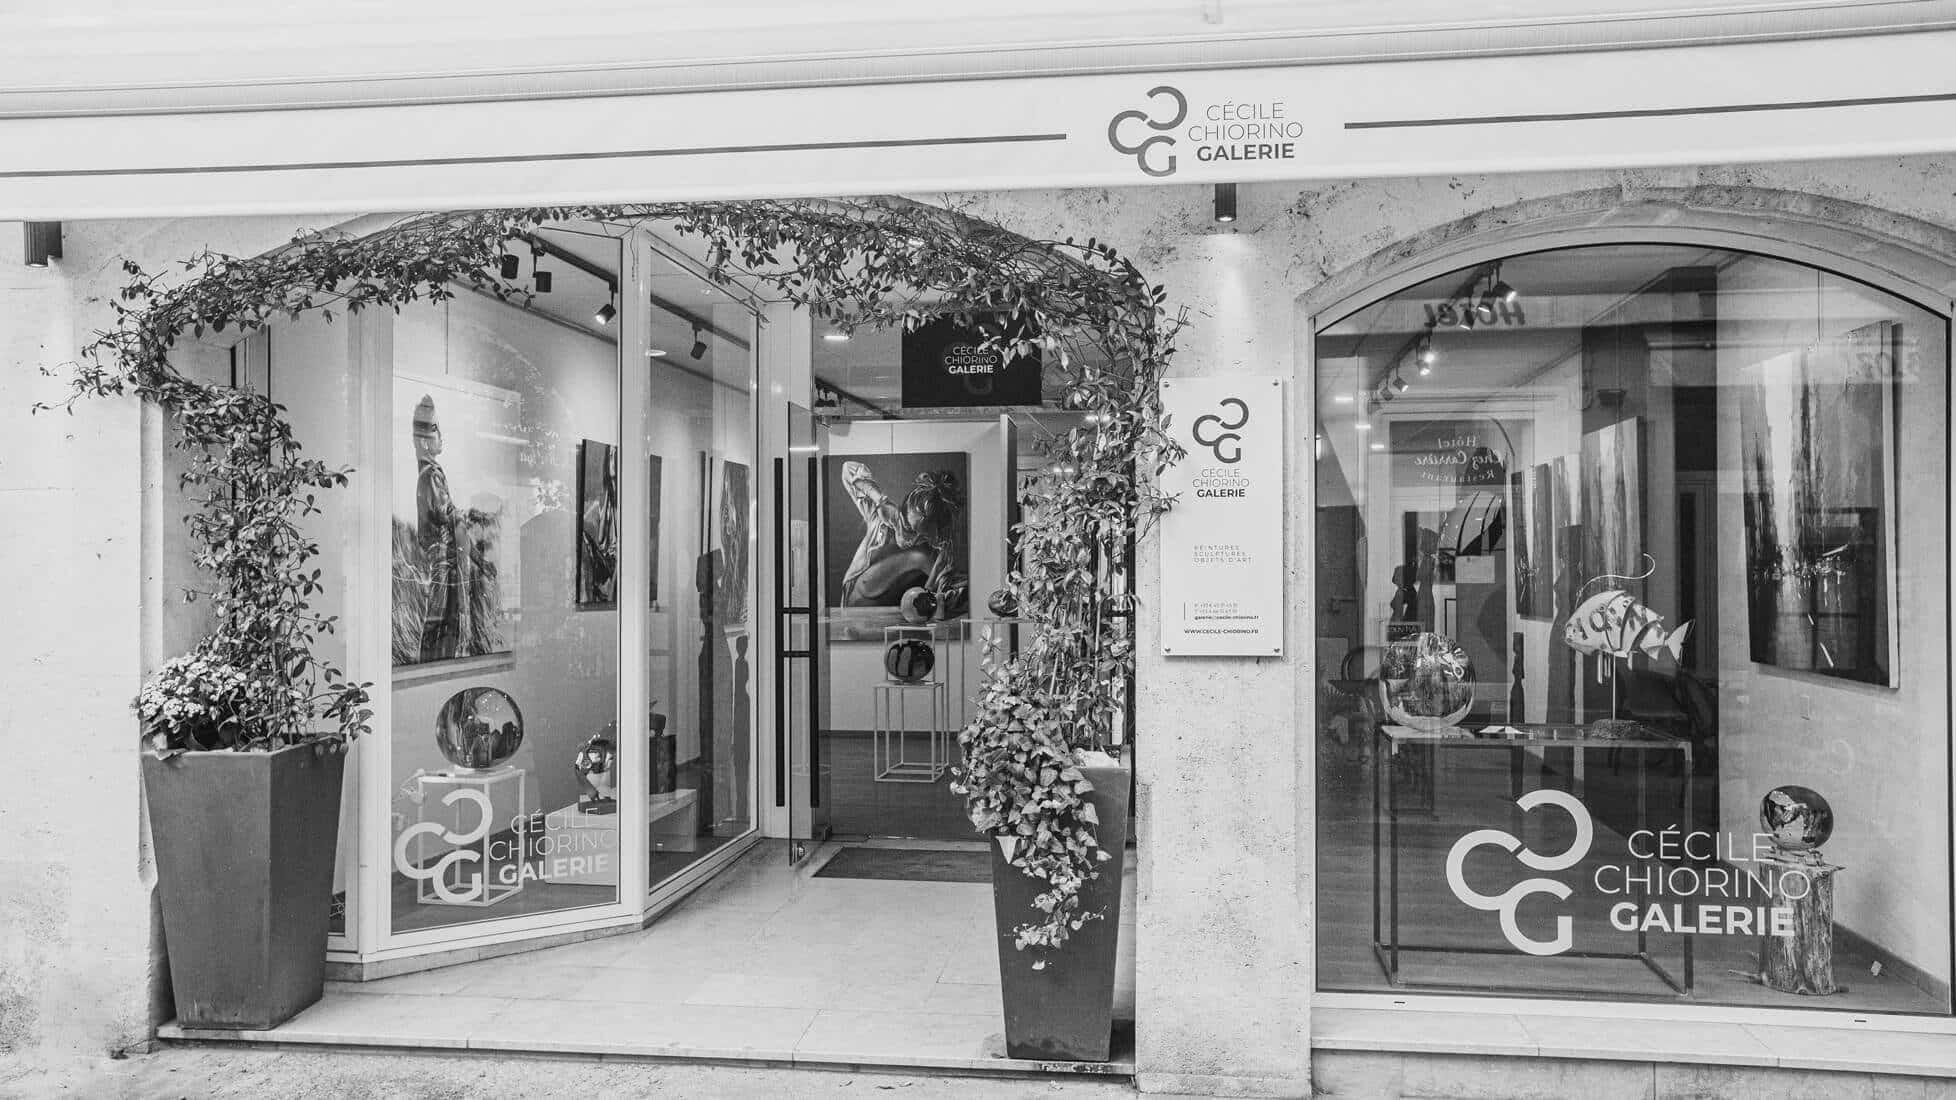 Galerie Cécile Chiorino Aigues-Mortes